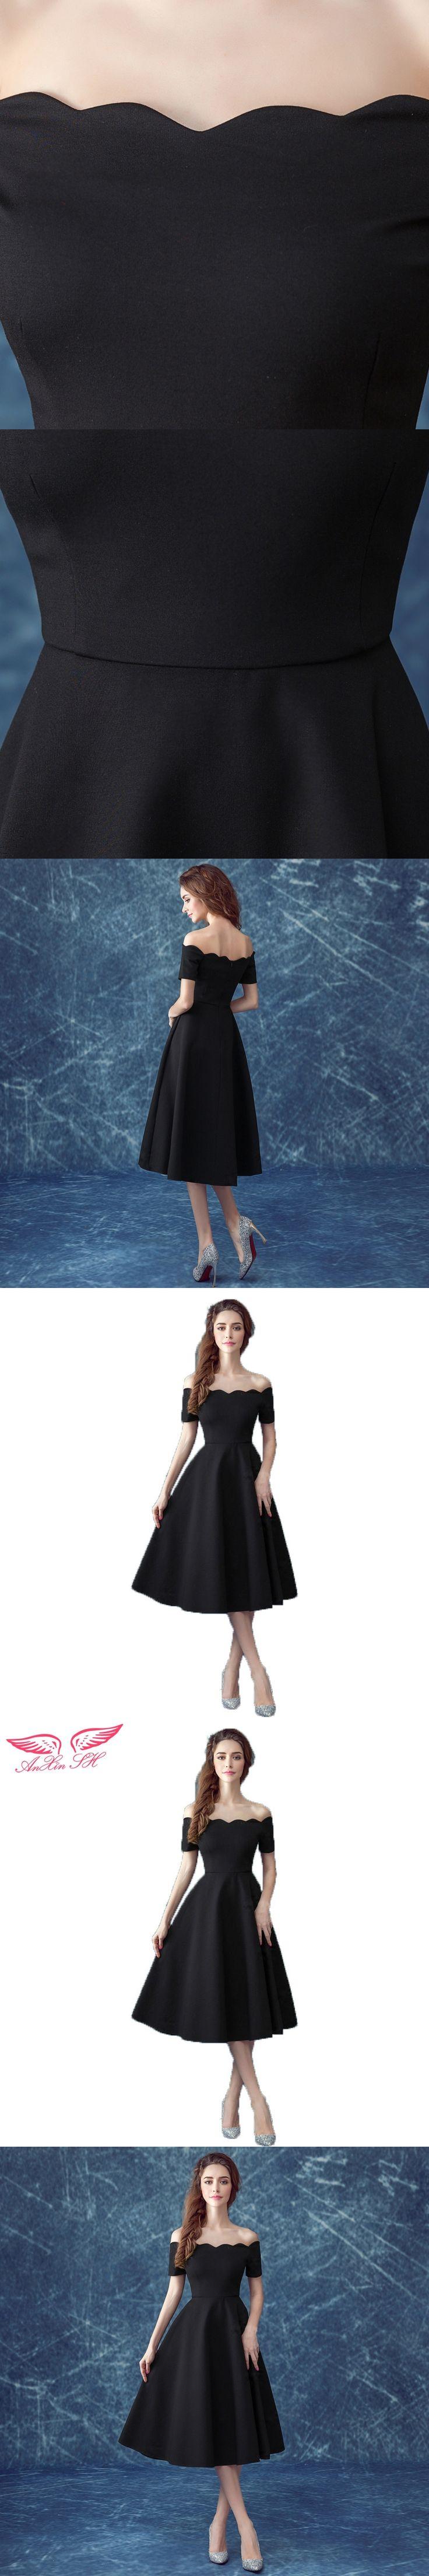 AnXin SH Black boat neck evening dress dinner perform short princess black evening dress nightclub little black dress 318Q